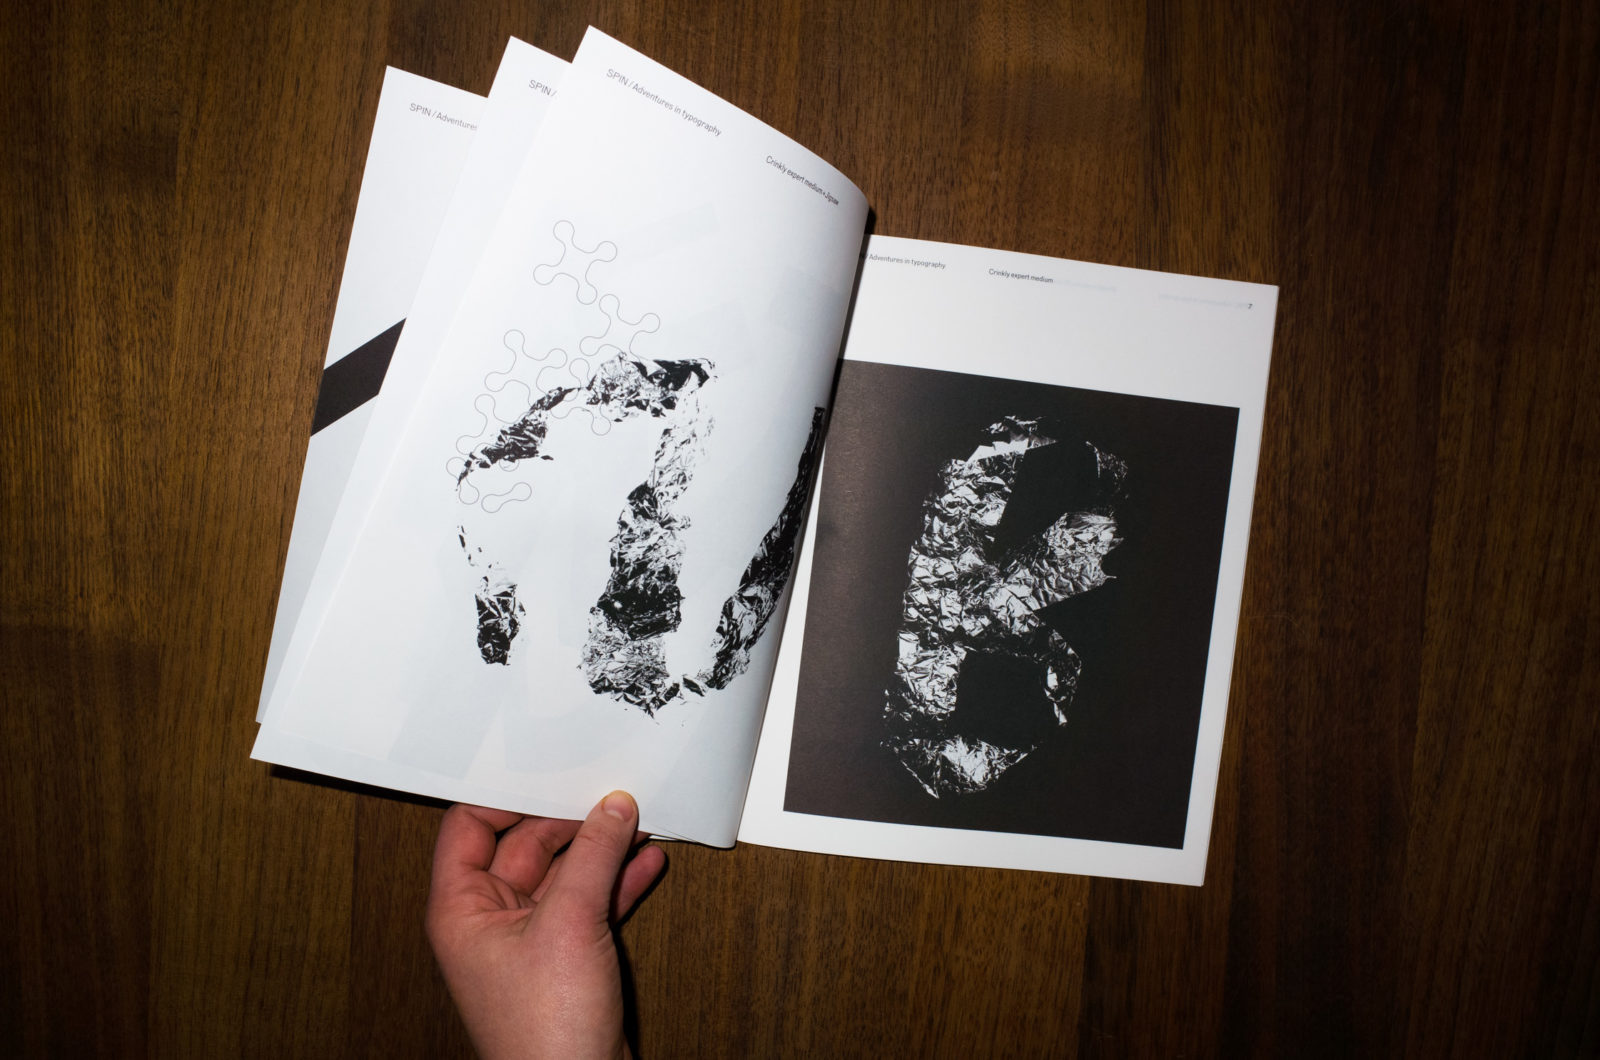 Crinkly expert medium + Jigsaw (left) Crinkly expert medium (right)